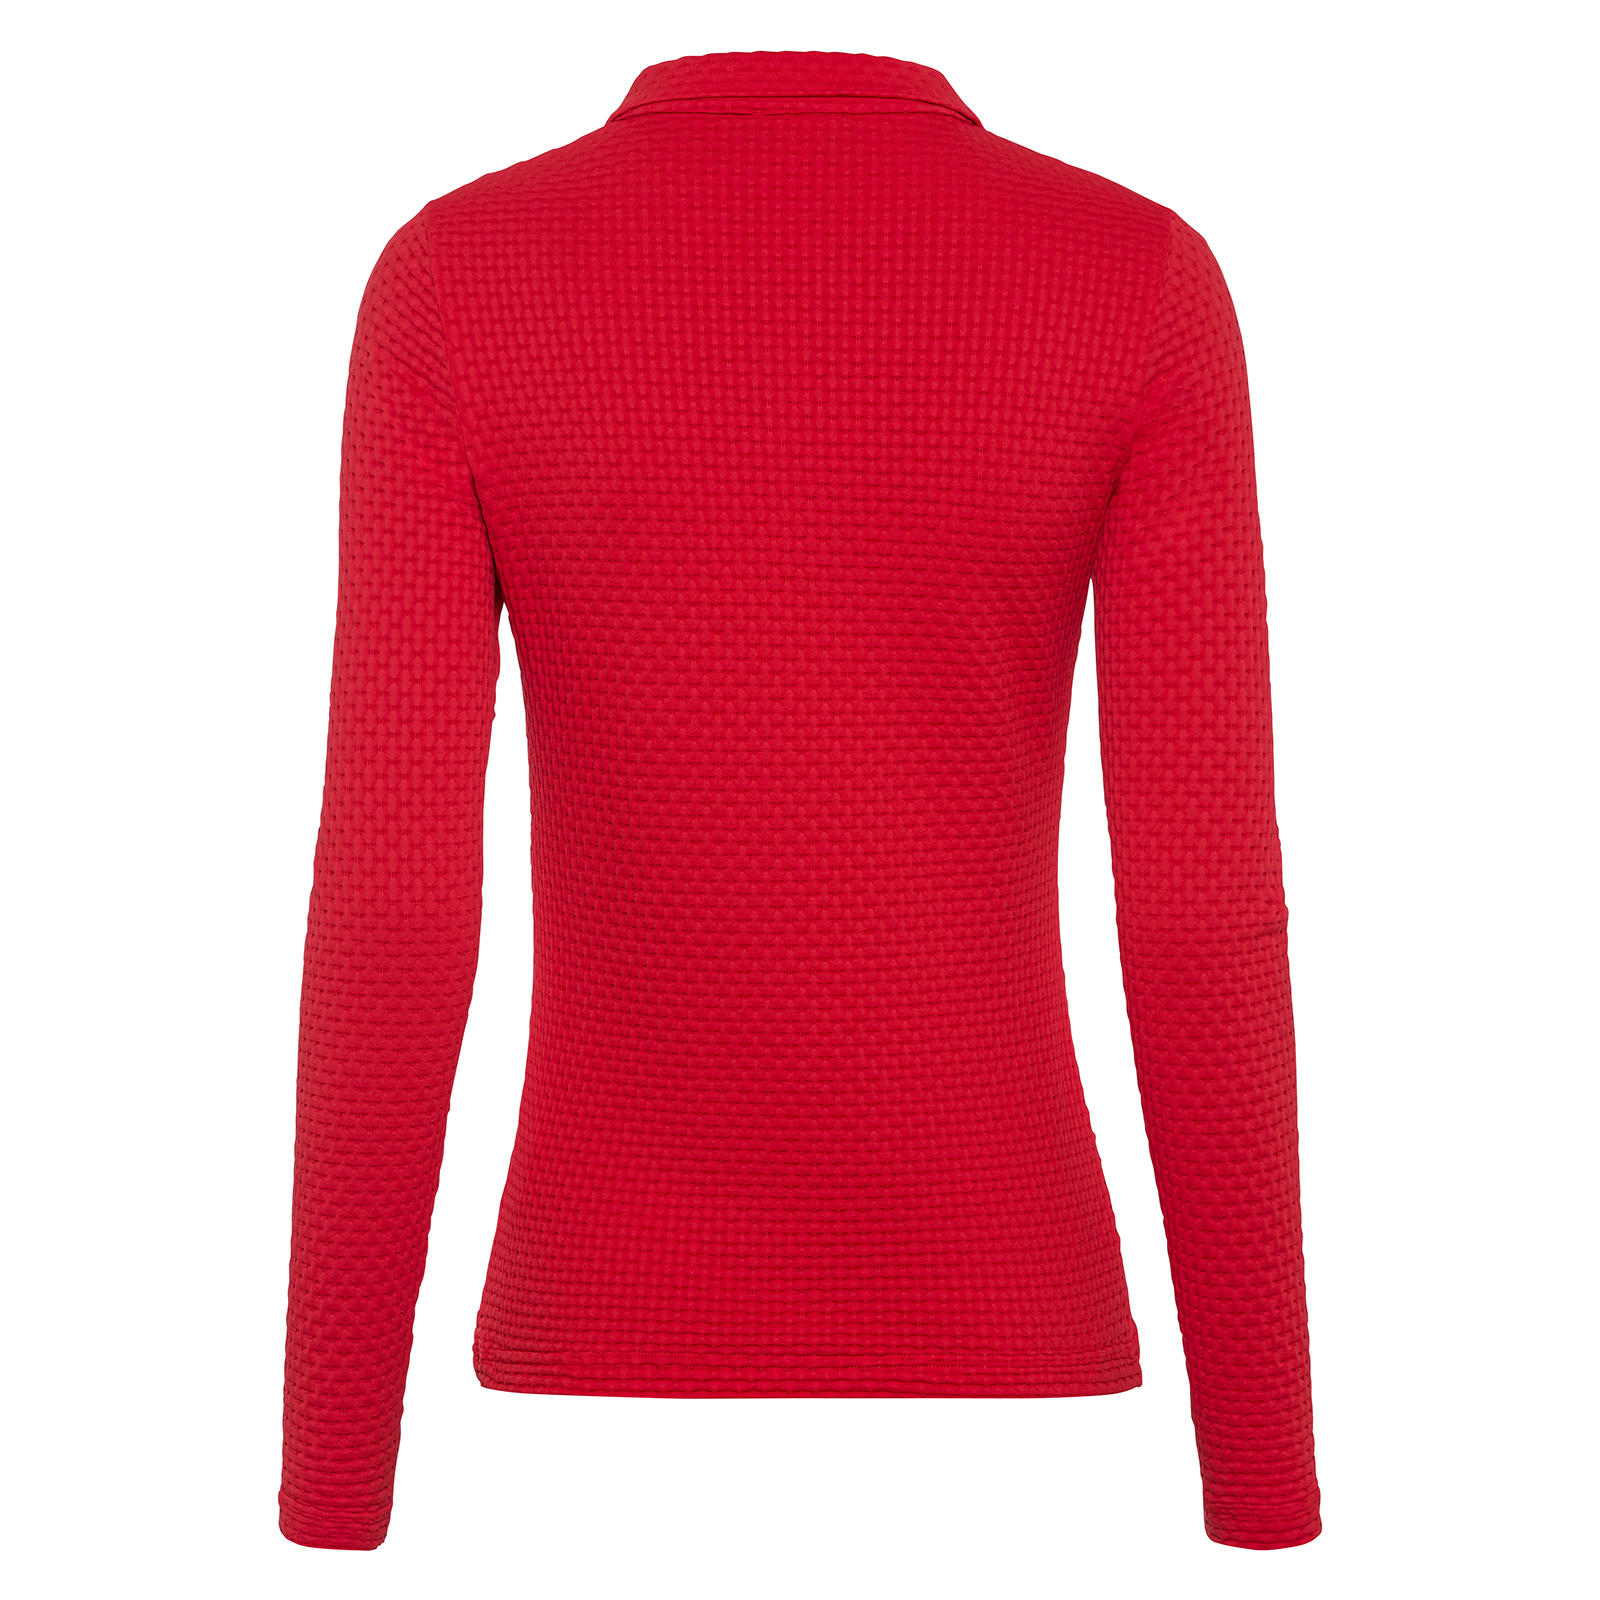 Elastischer Damen Pullover